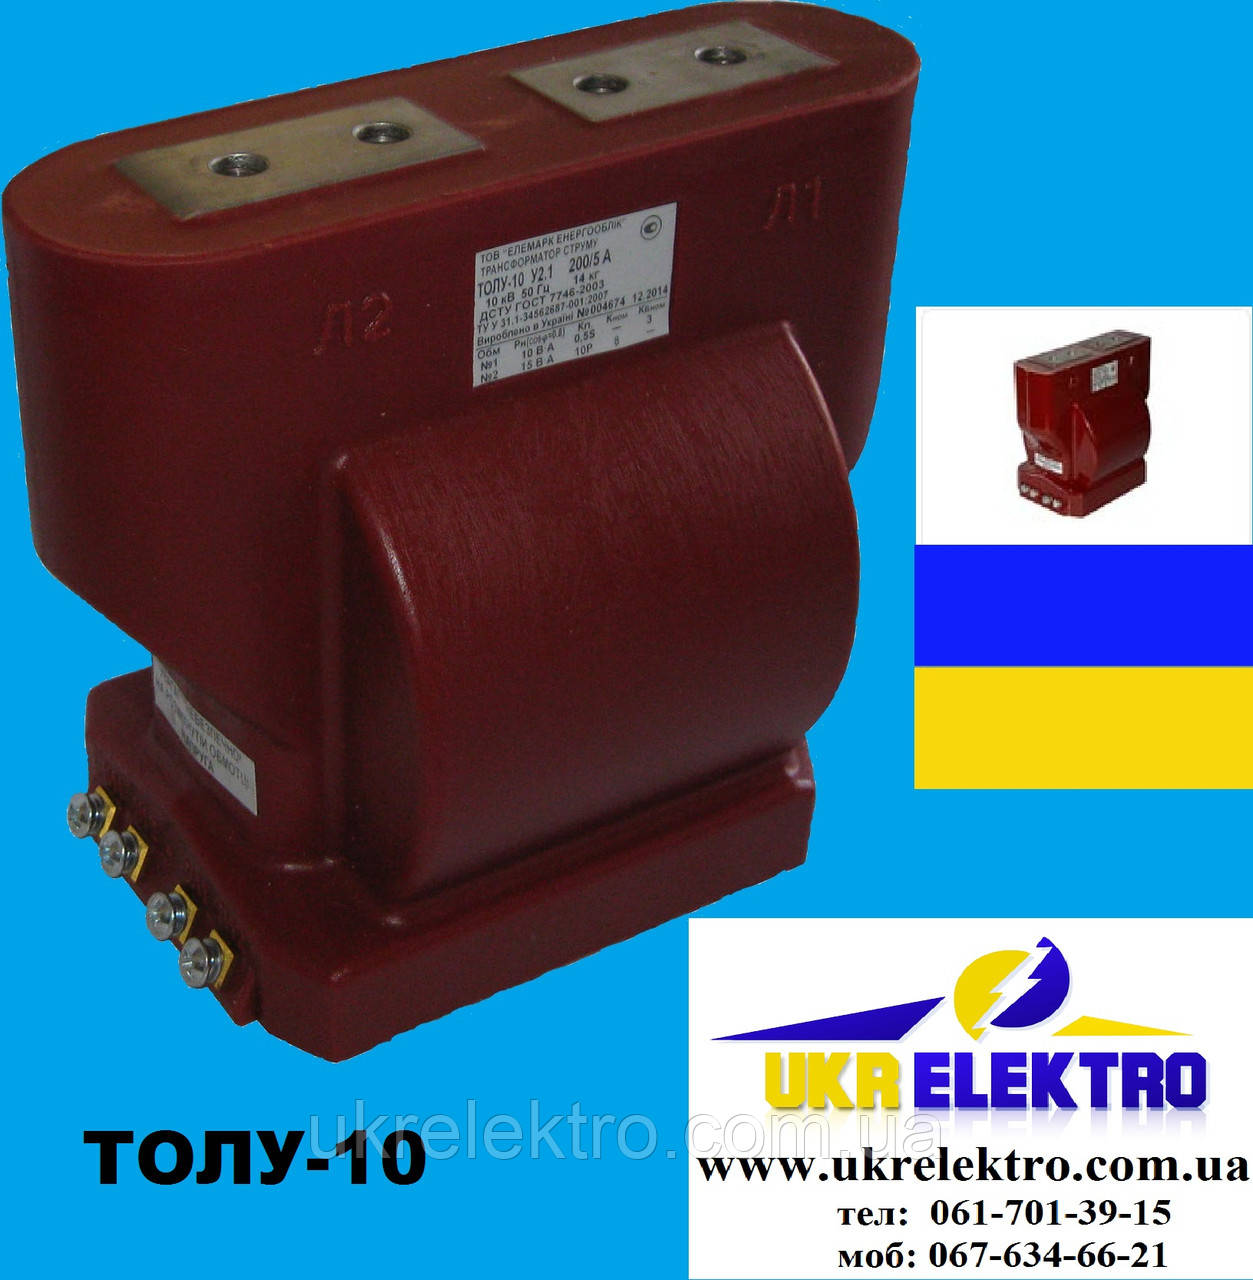 Трансформатор тока ТОЛУ-10 100/5 0,5s